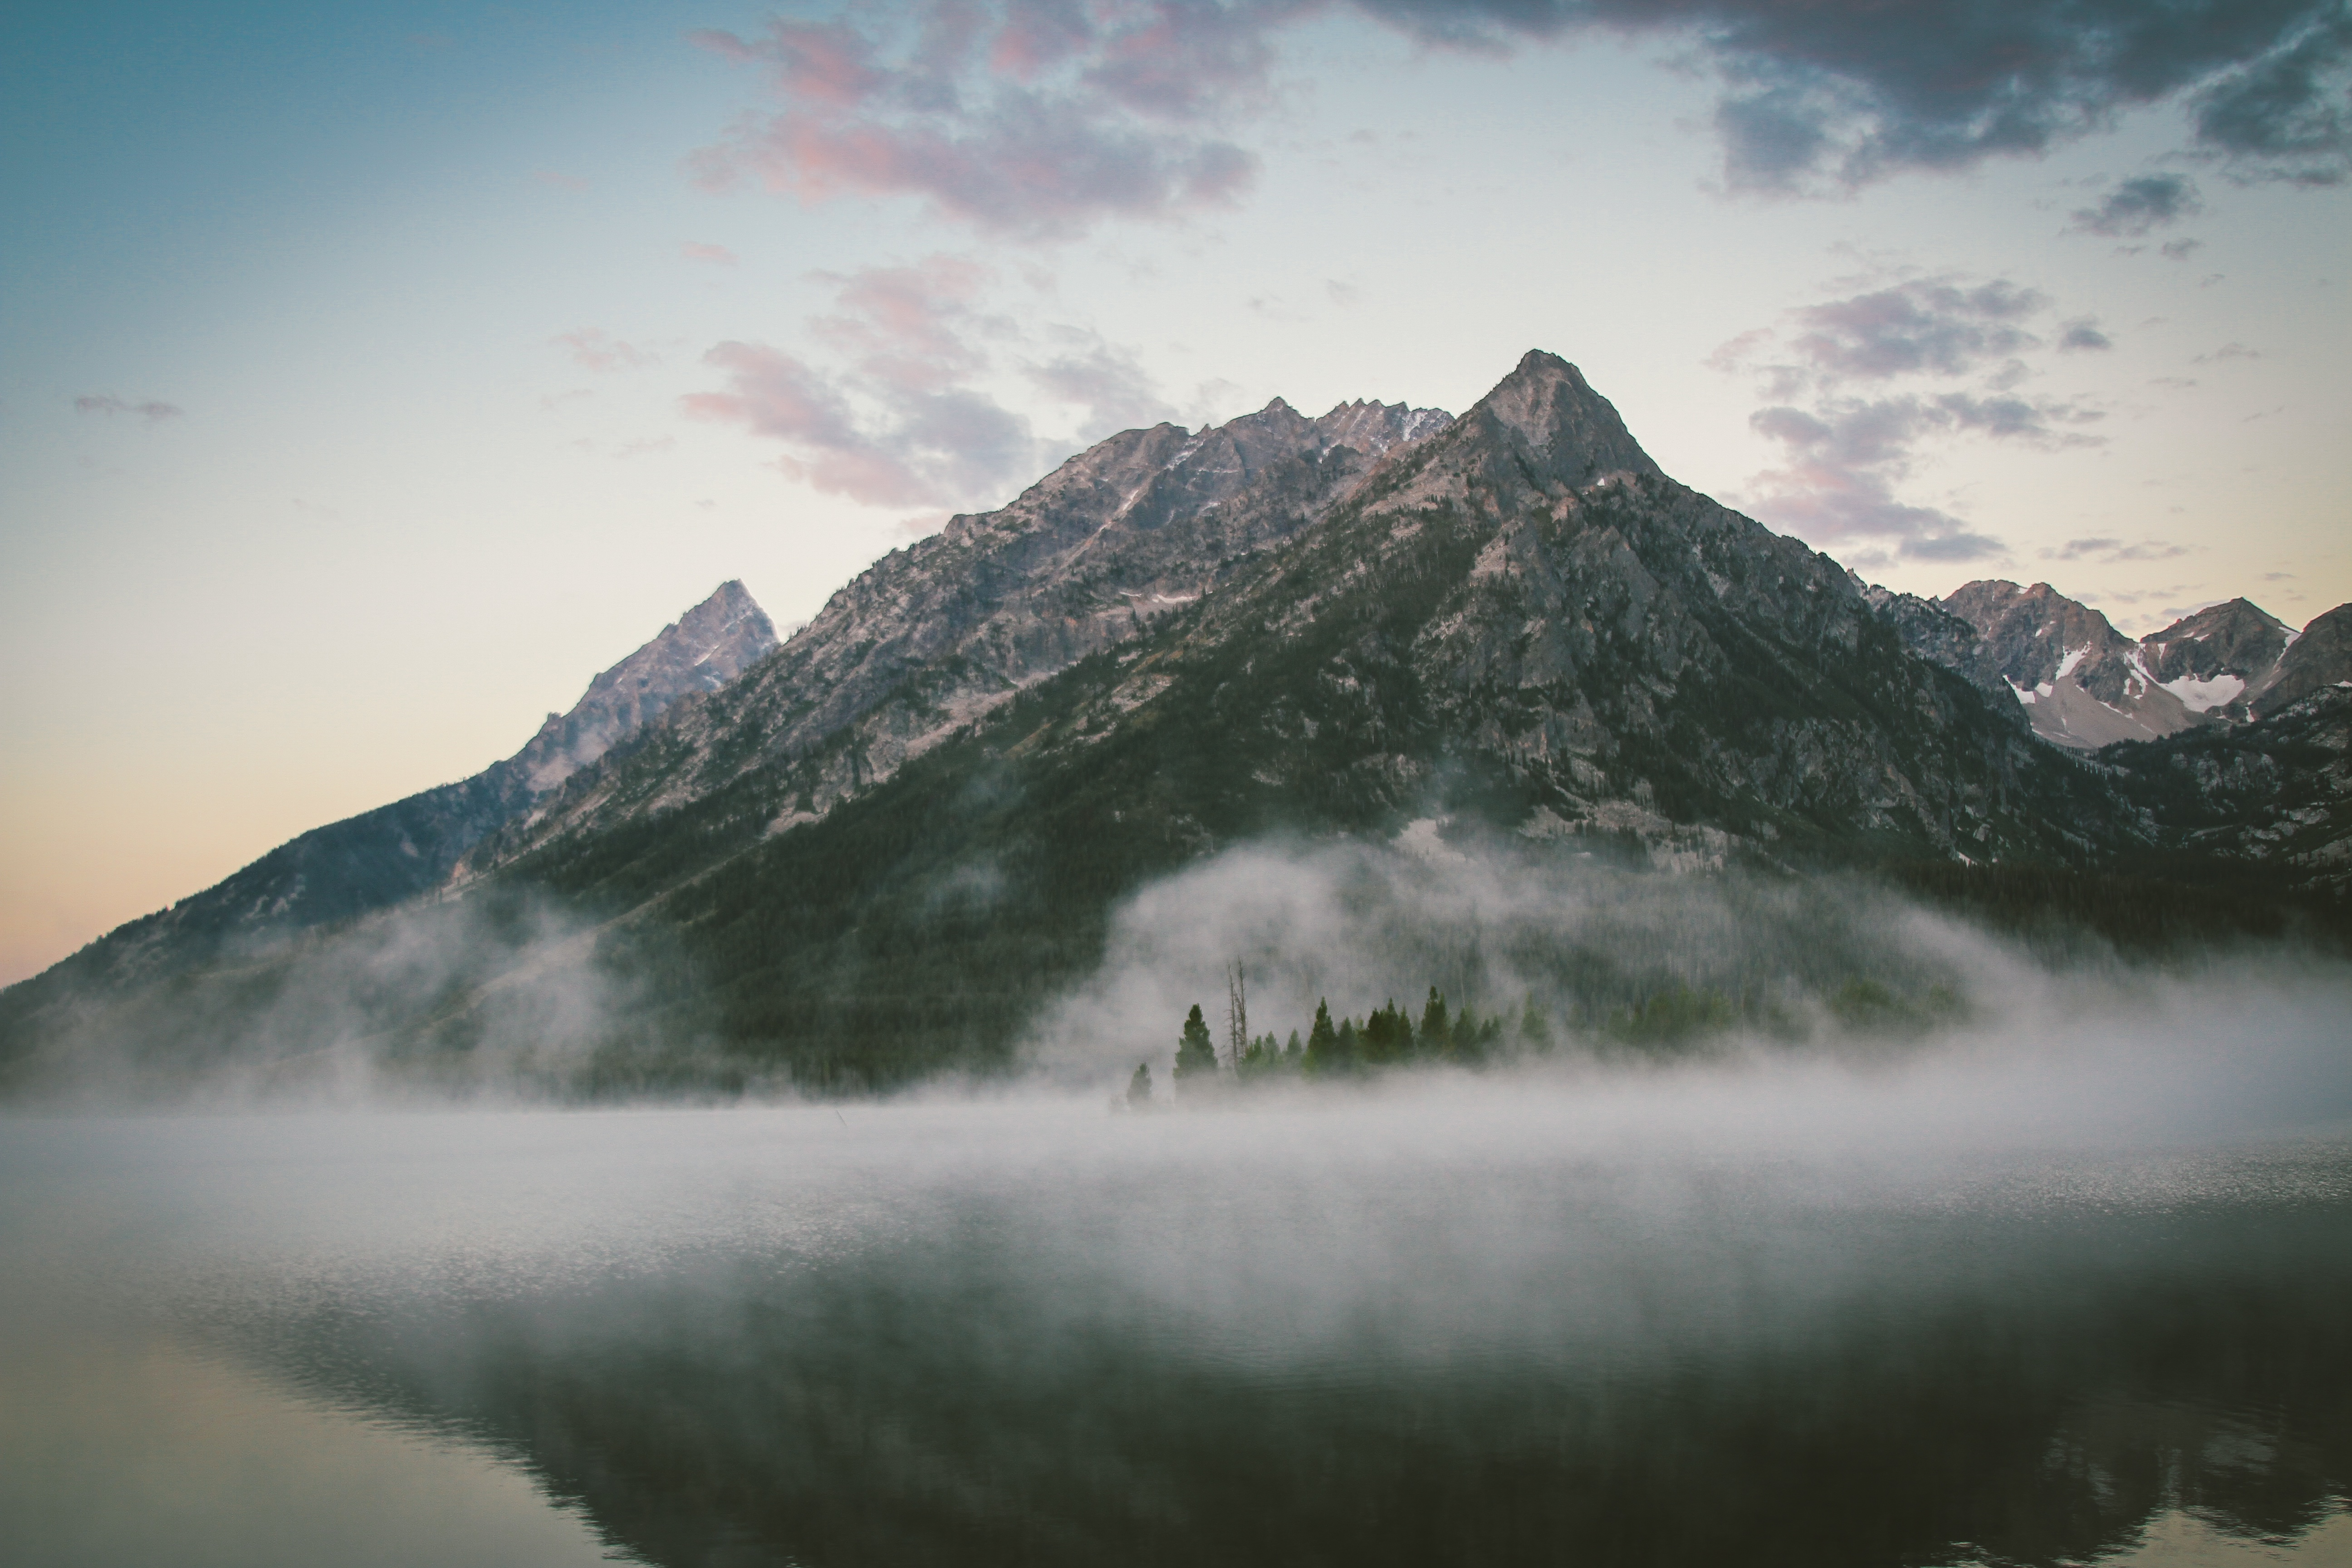 landscape-mountains-nature-mountain